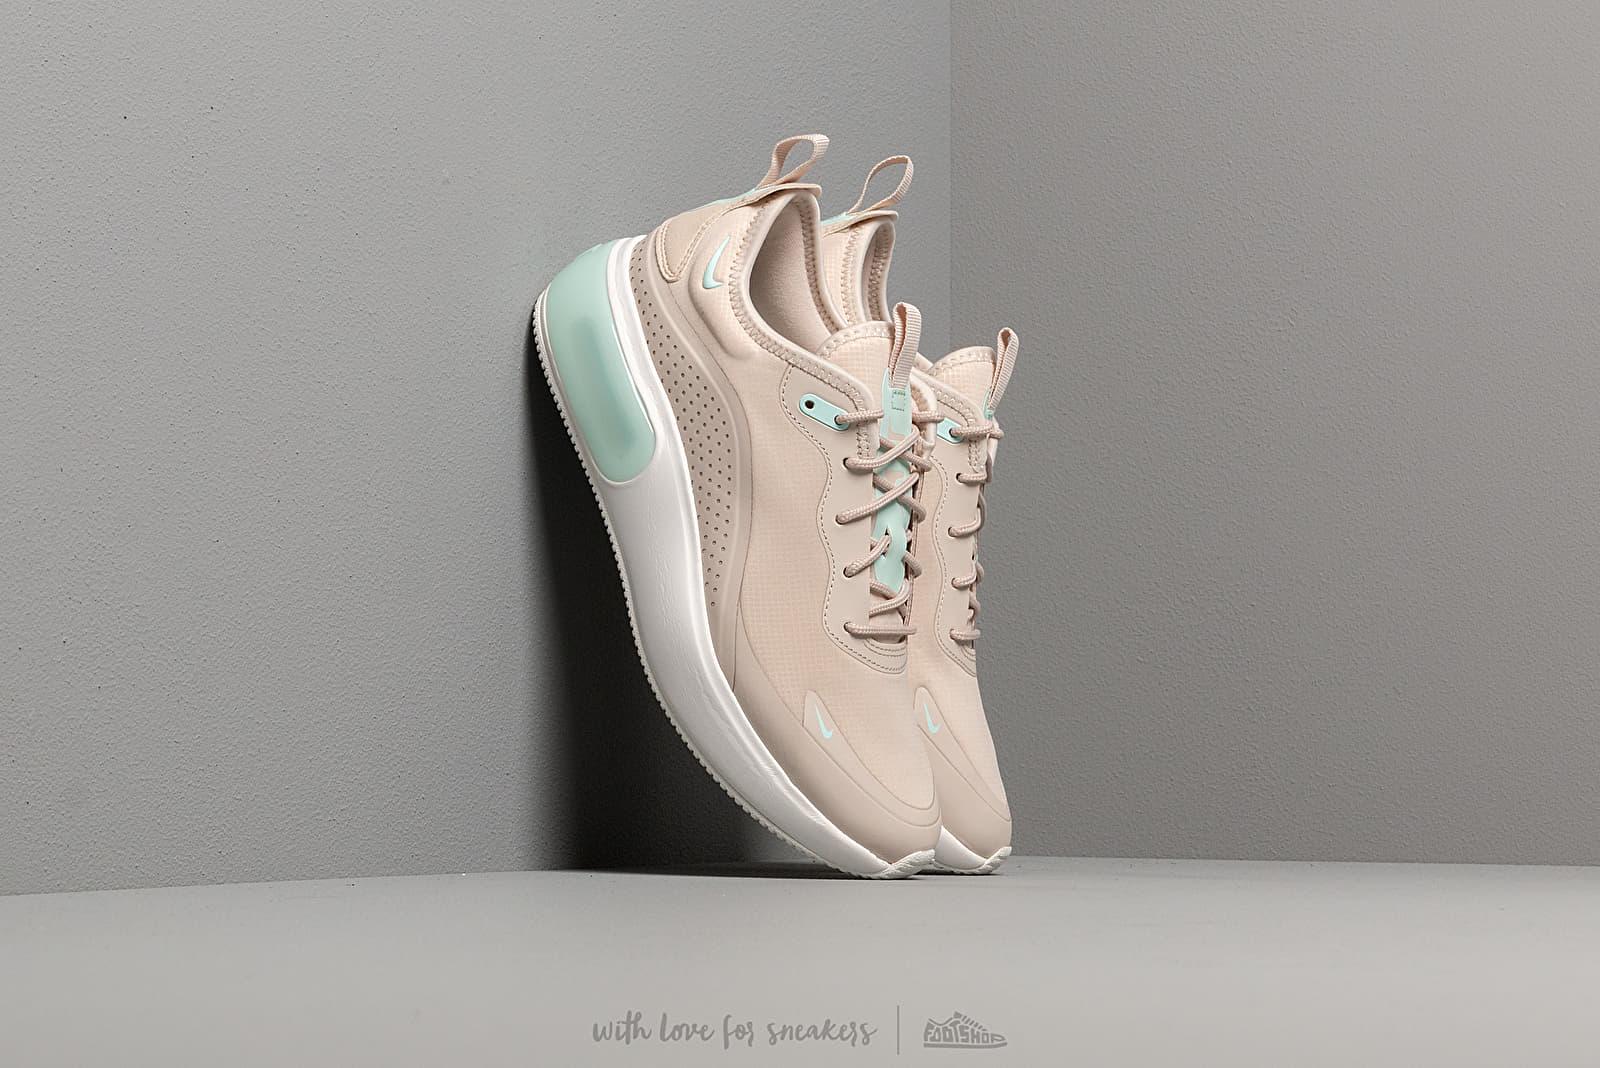 Nike W Air Max Dia Lt Orewood Brn Teal Tint Summit White | Footshop